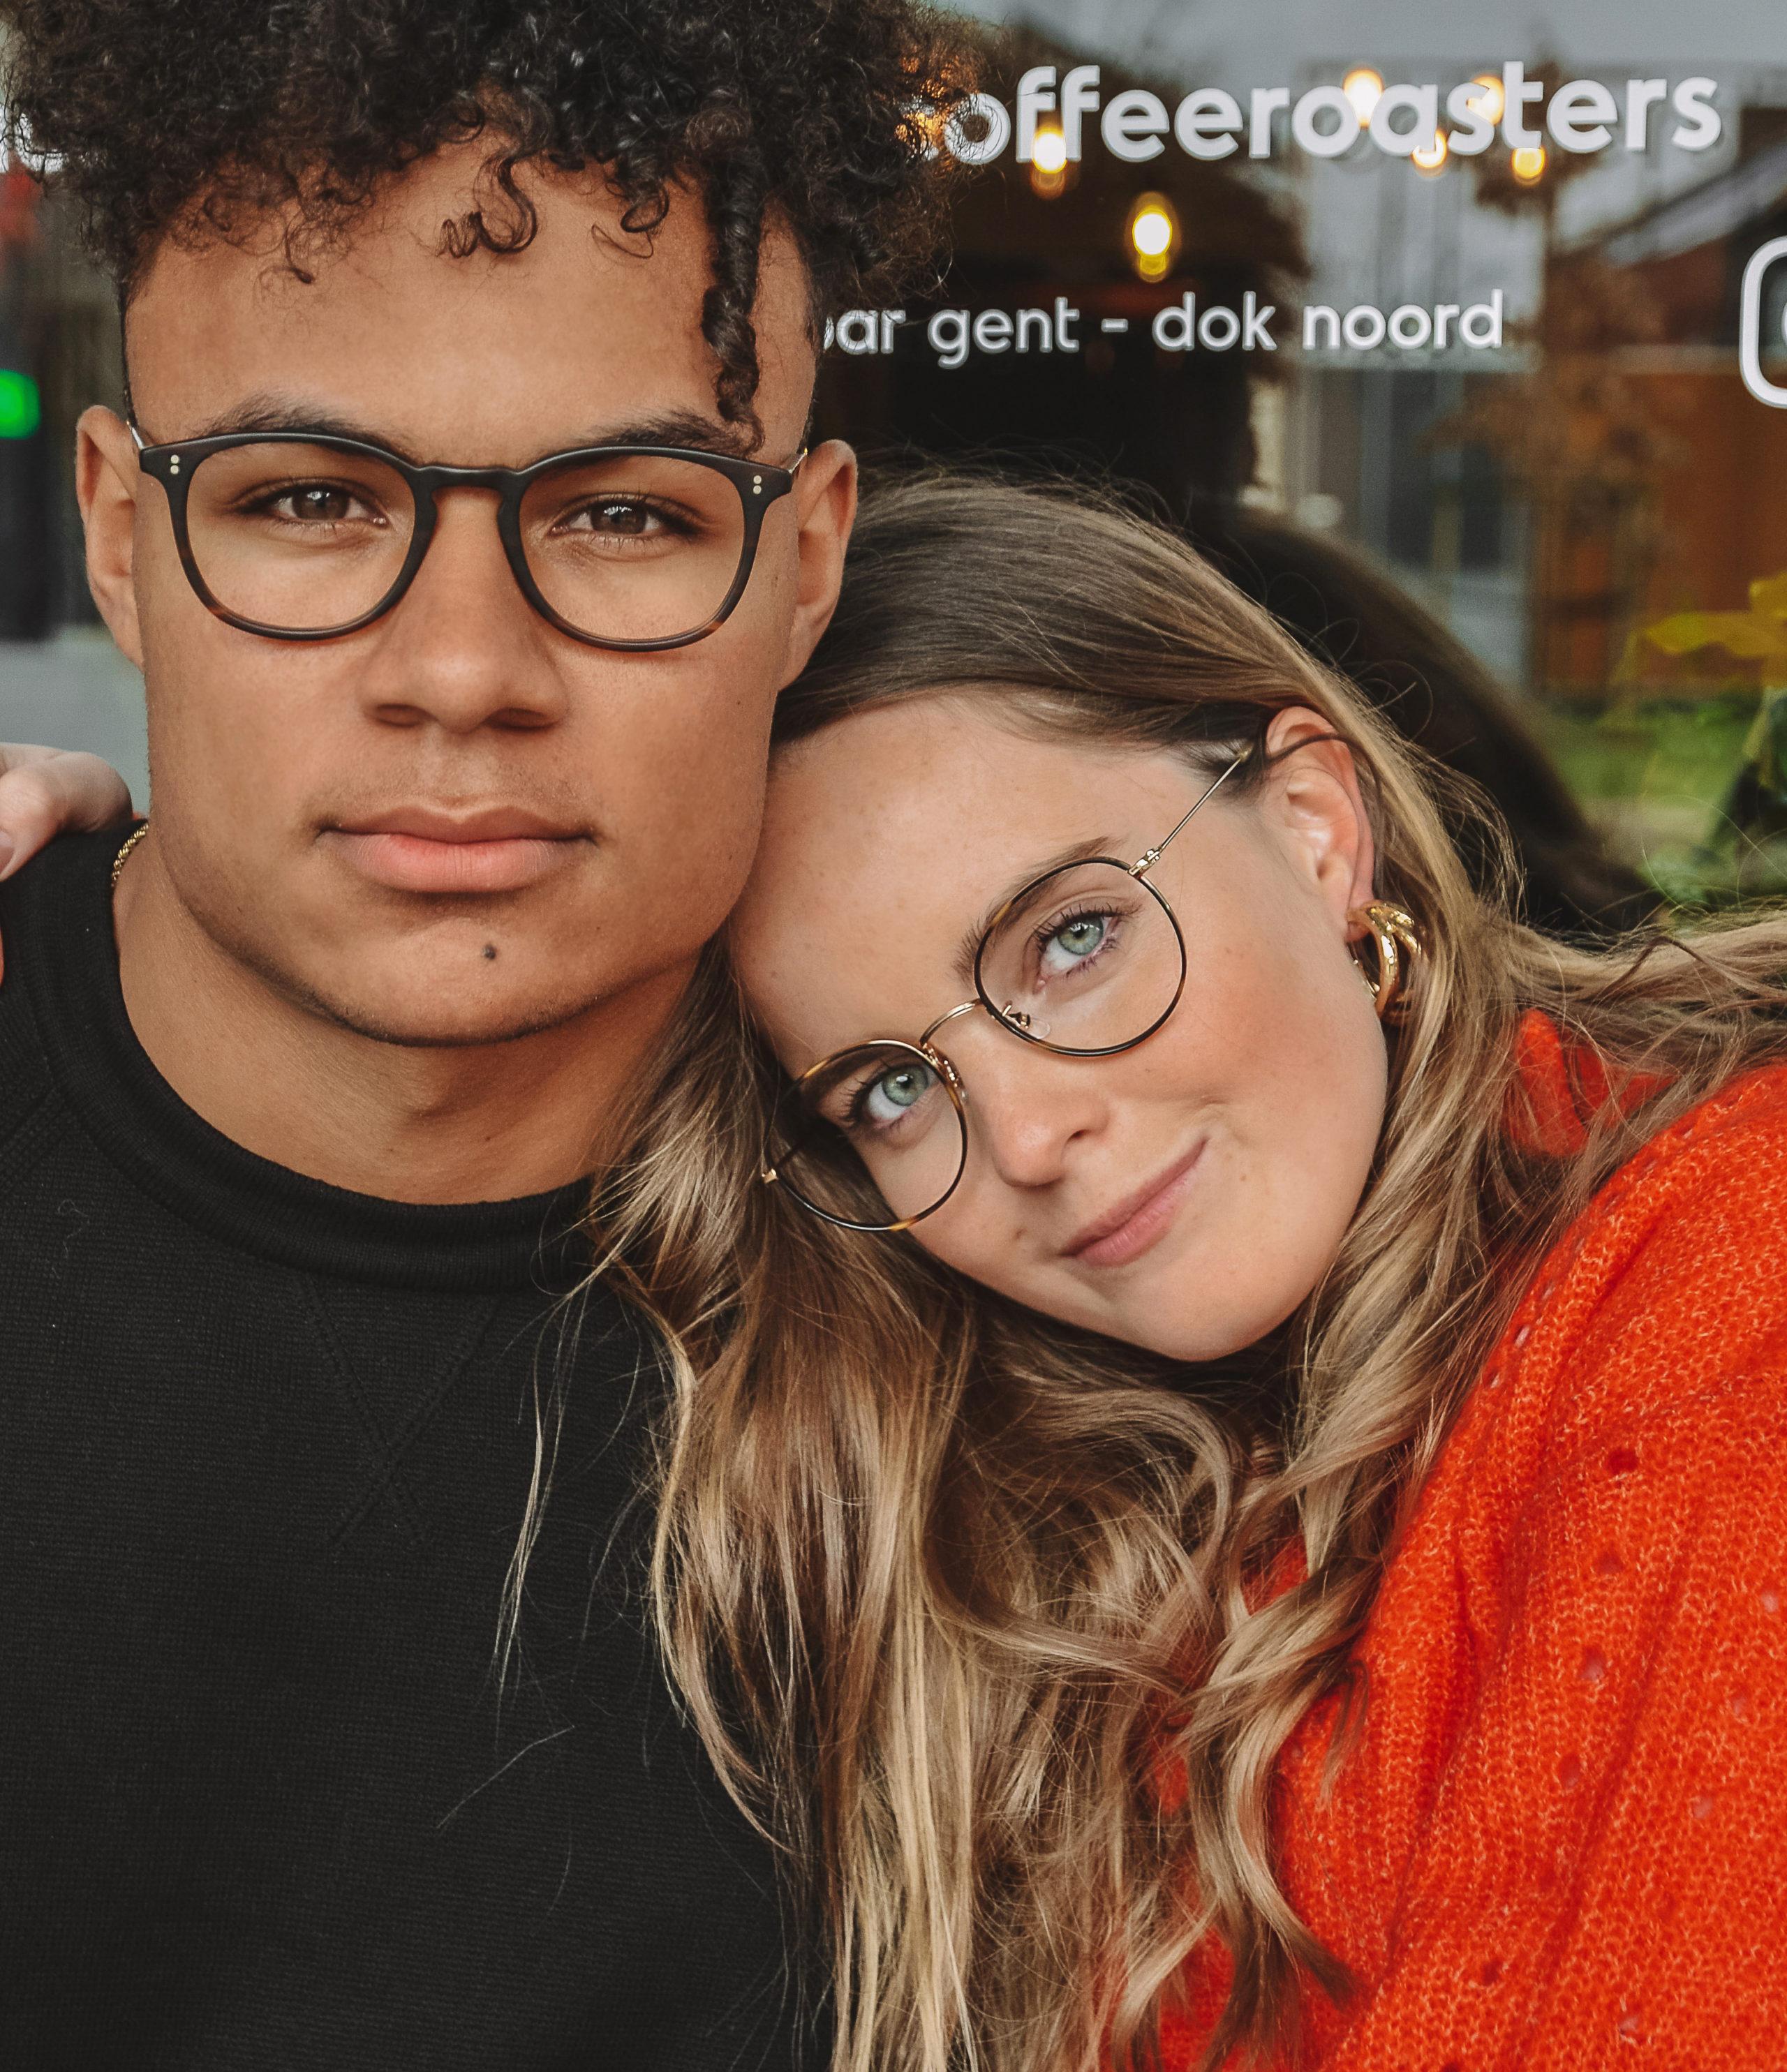 Veilig shoppen bij Frames and Faces • Frames and Faces